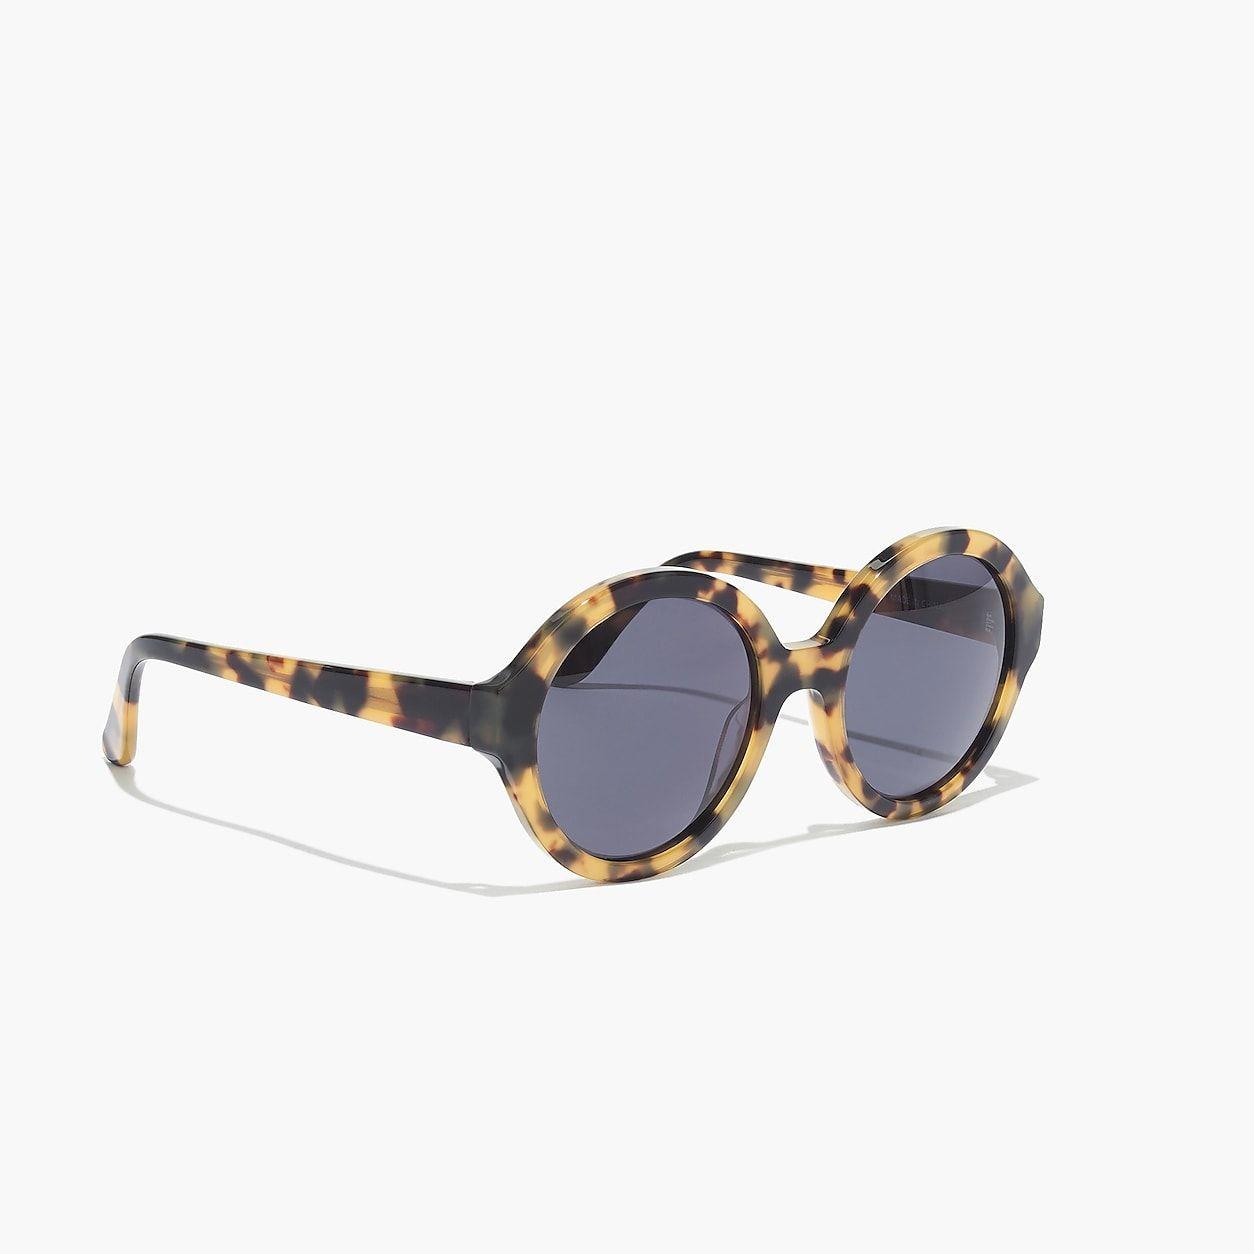 1b9d50f861 Carnival Round Sunglasses. Carnival Round Sunglasses Colorful Frames